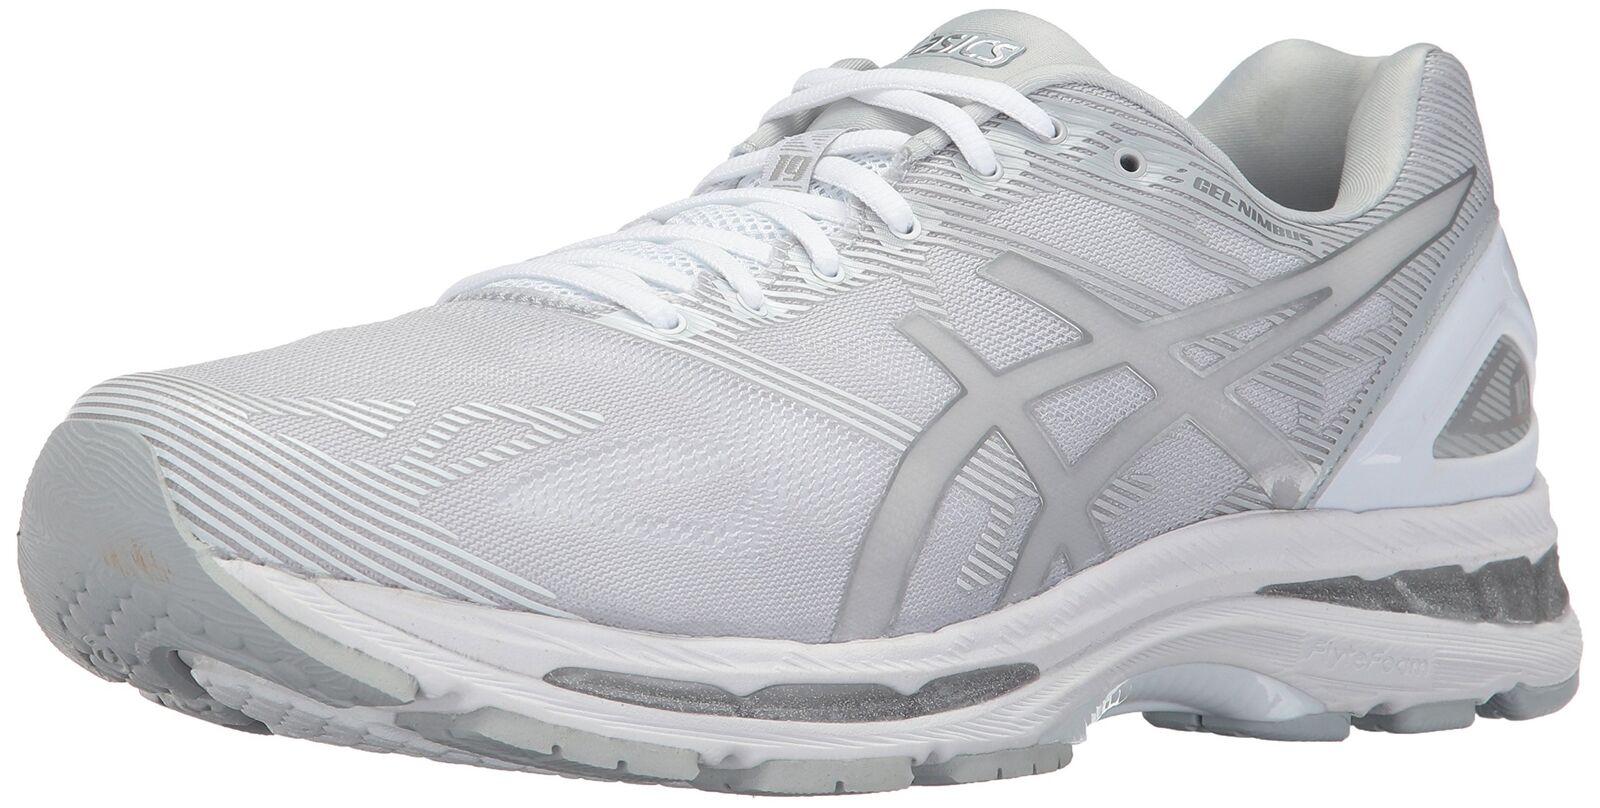 Asic uomini 'gel corsa, nimbus 19 scarpa da corsa, 'gel ghiacciaio grigio / argento / white 10,5 s (m.nuova 0b473c